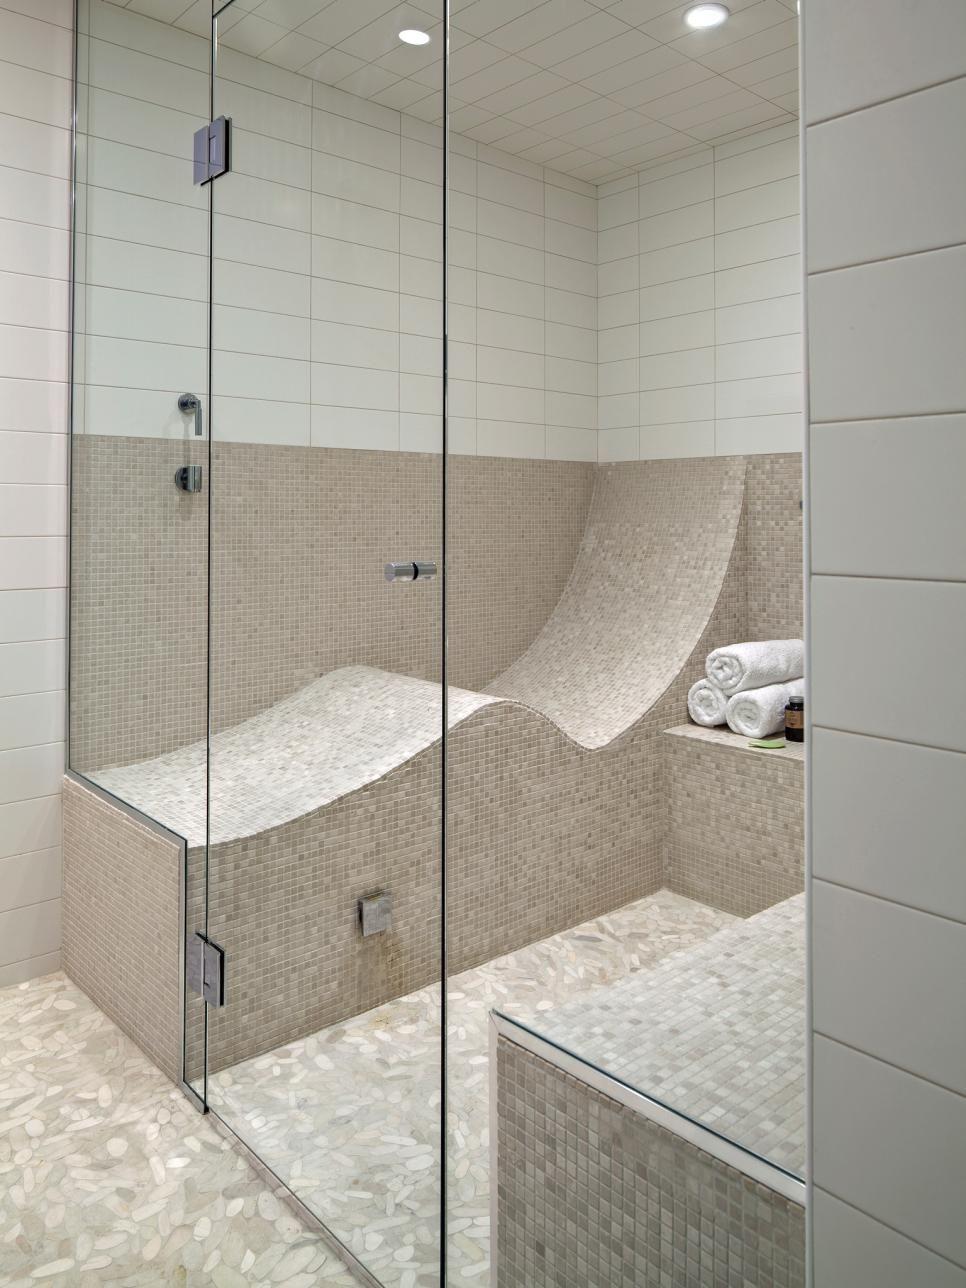 Inspiring Spa Like Bathrooms Spa Inspired Bathroom Bathroom Tile Designs Bathroom Remodel Master